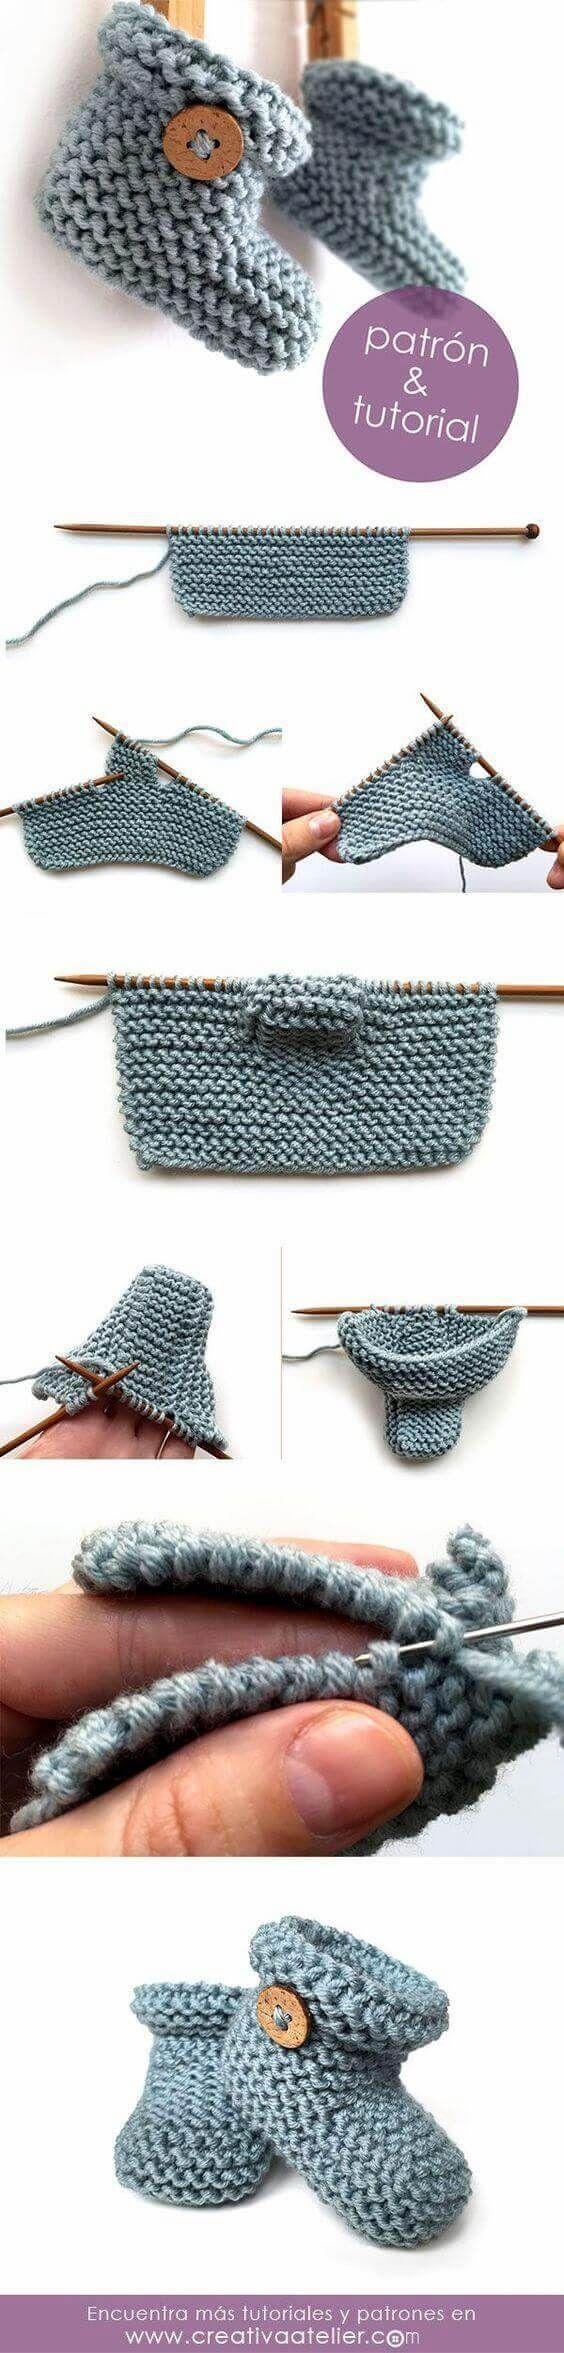 En modern 23 rg bebek patik modelleri ve yapllar rg patucos de punto sencillos tutorial y patrn simple knitted baby booties pattern and tutorial page is in spanish or portuguese or something bankloansurffo Image collections